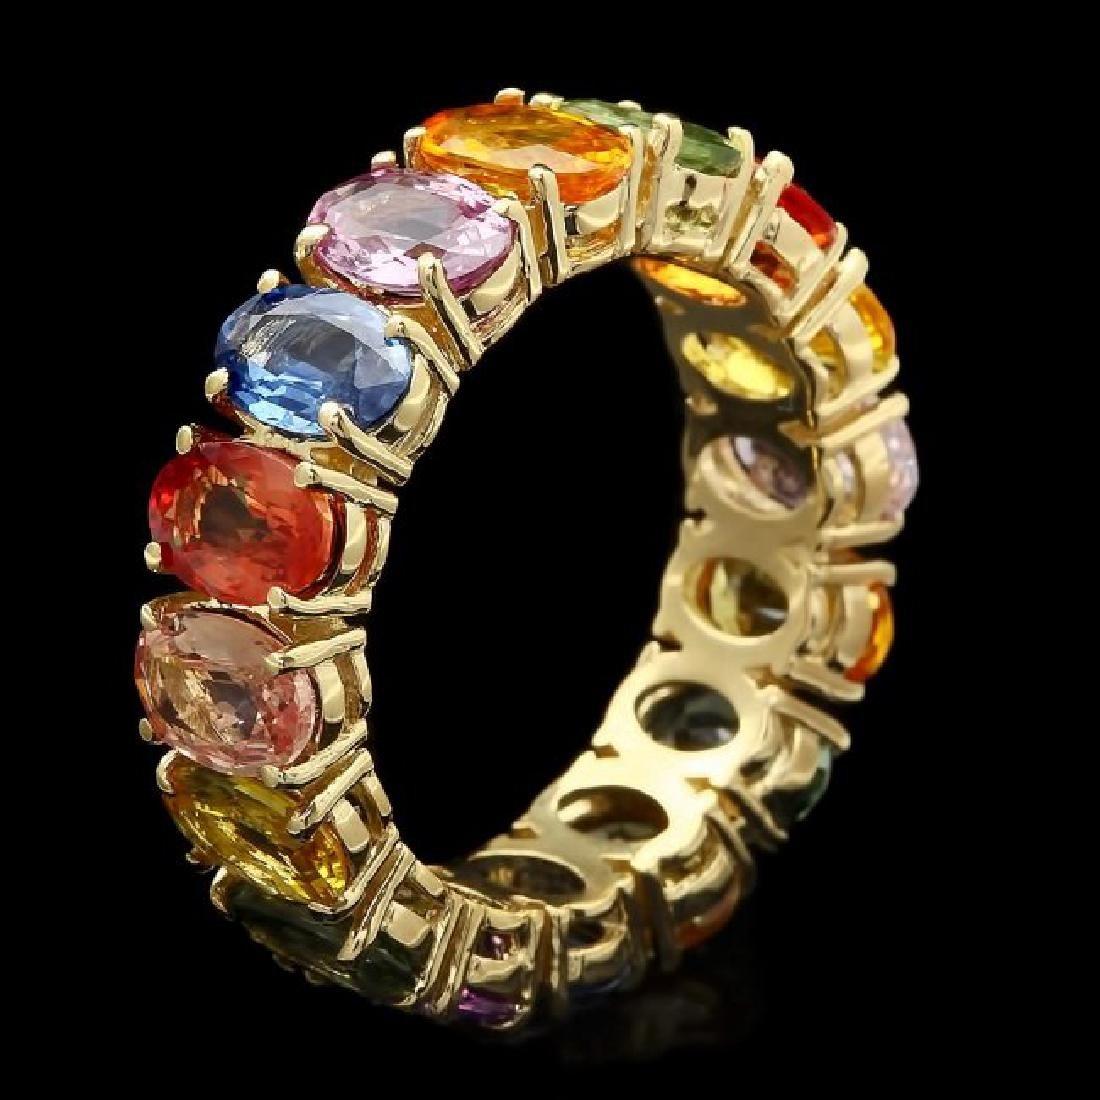 14k Yellow Gold 7.80ct Sapphire Ring - 2